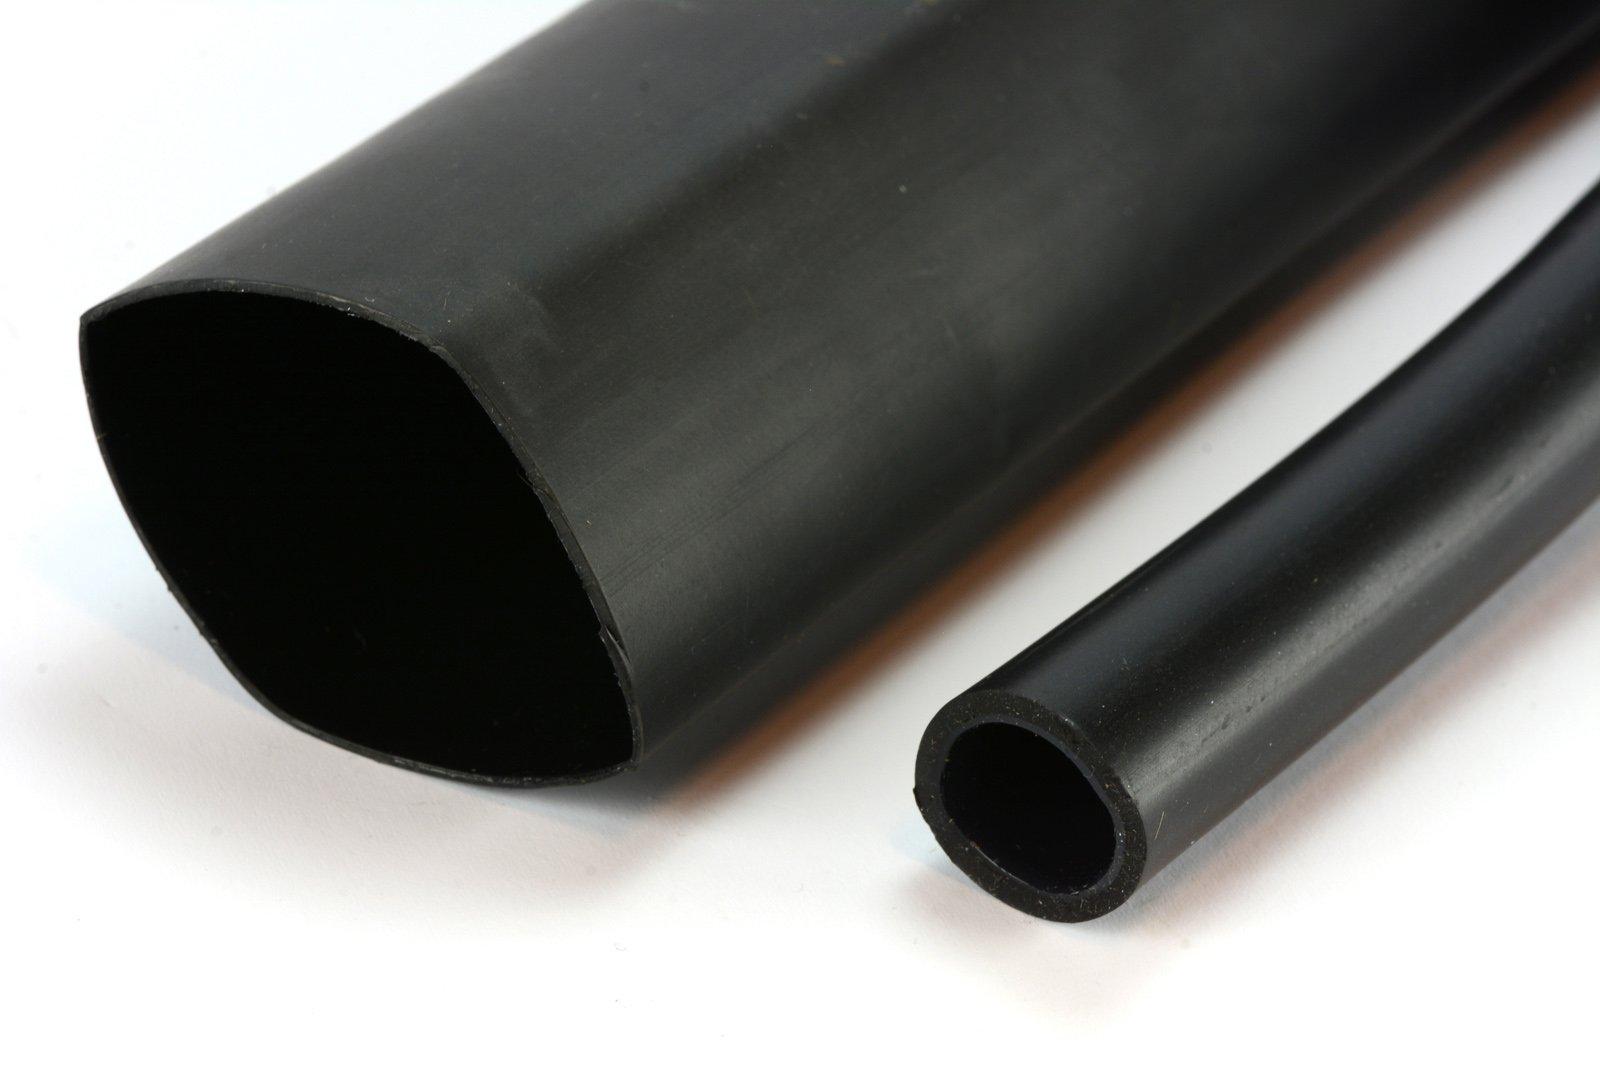 5 Lot TEMCo 1.5'' Marine Heat Shrink Tube 3:1 Adhesive Glue Lined 4 ft Black